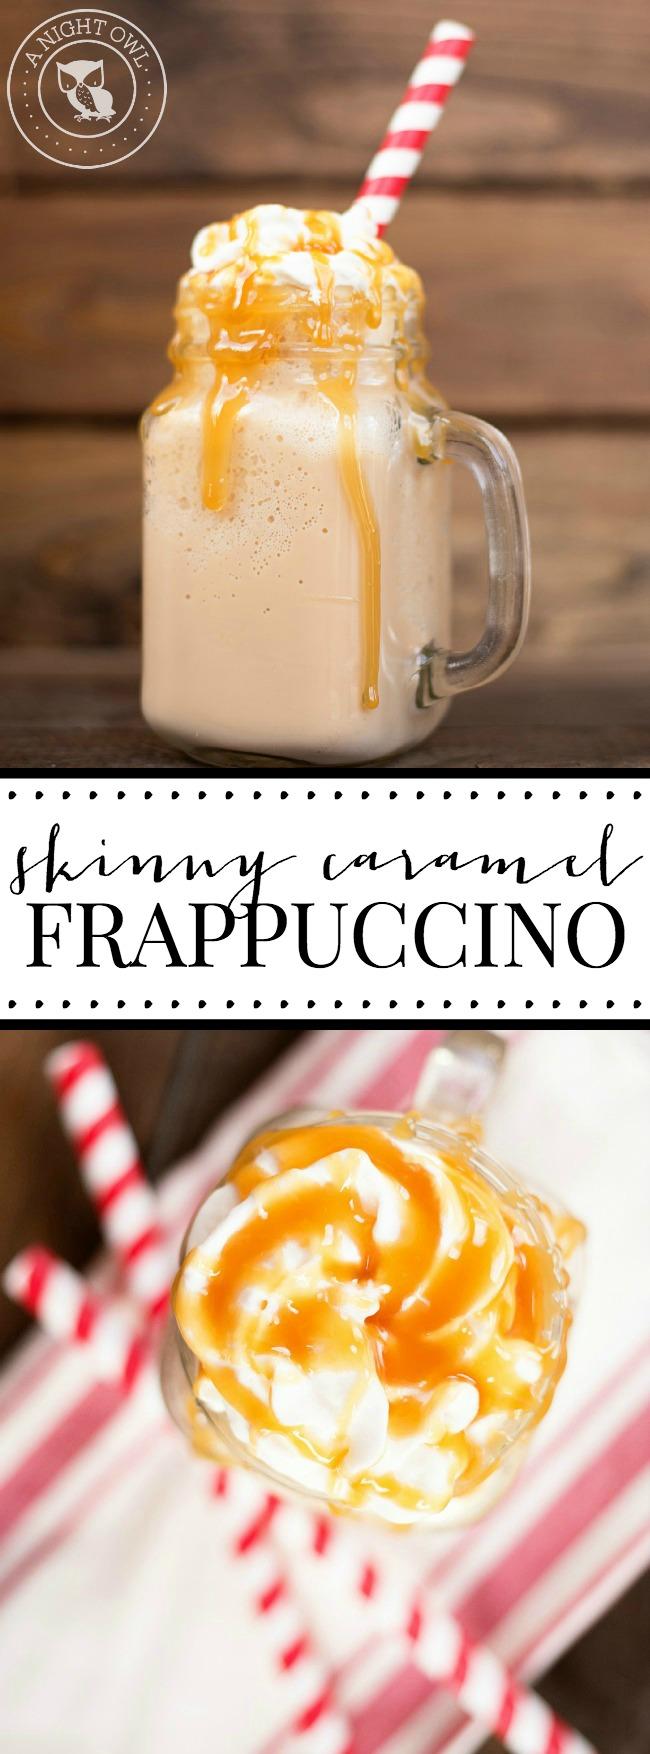 Skinny Caramel Frappuccino A Night Owl Blog